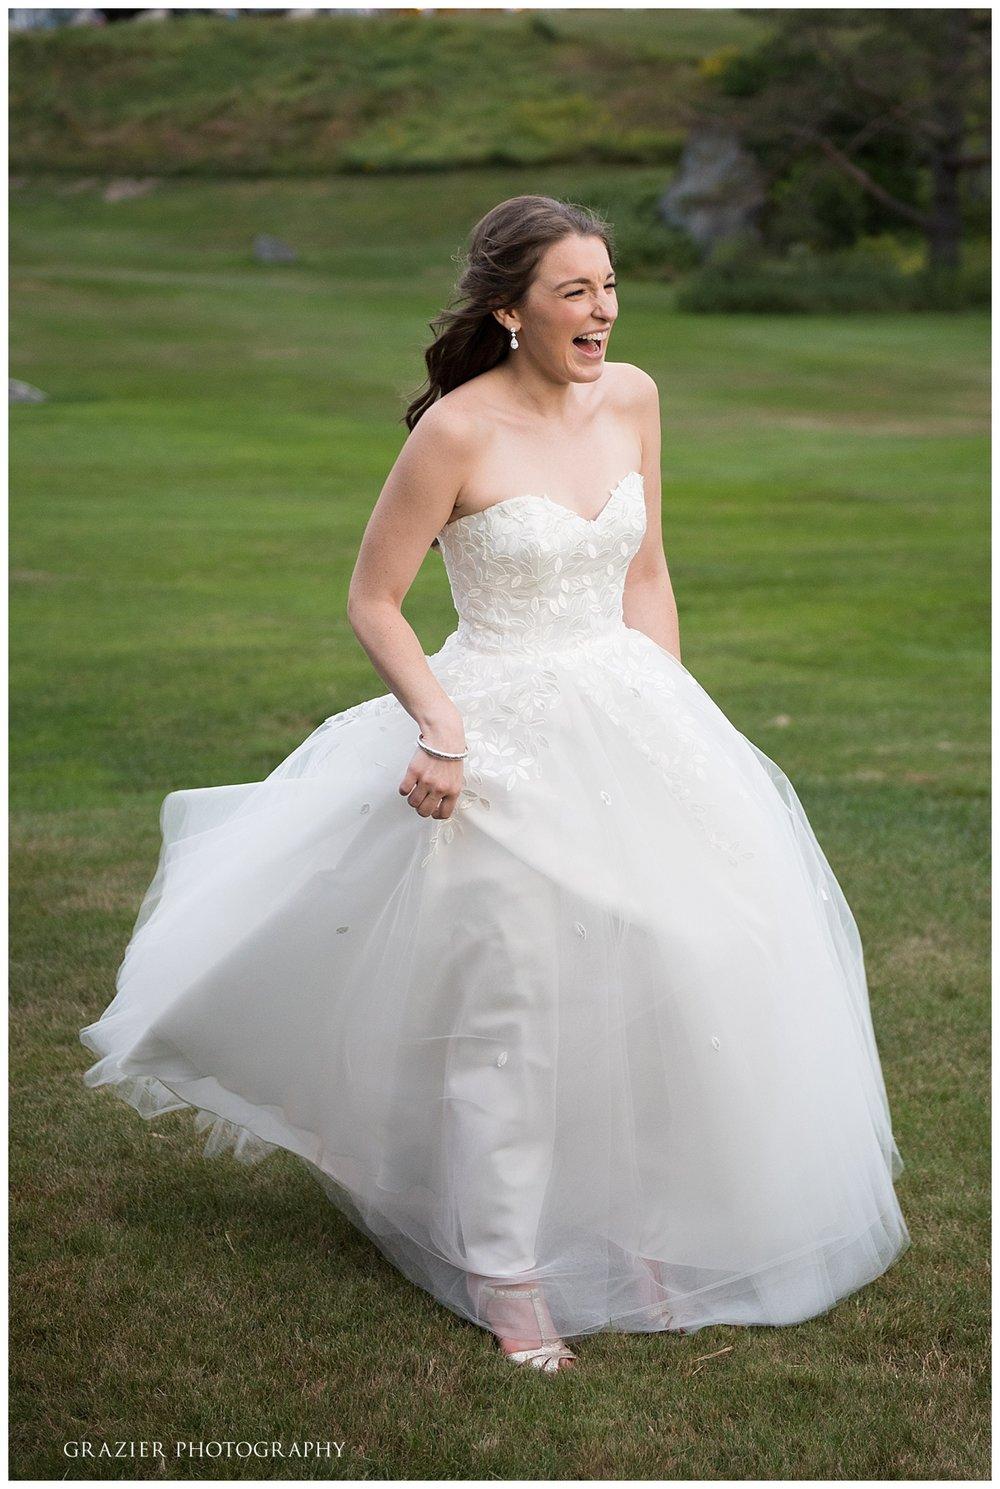 Mount Washington Hotel Wedding Grazier Photography 171125-468_WEB.jpg